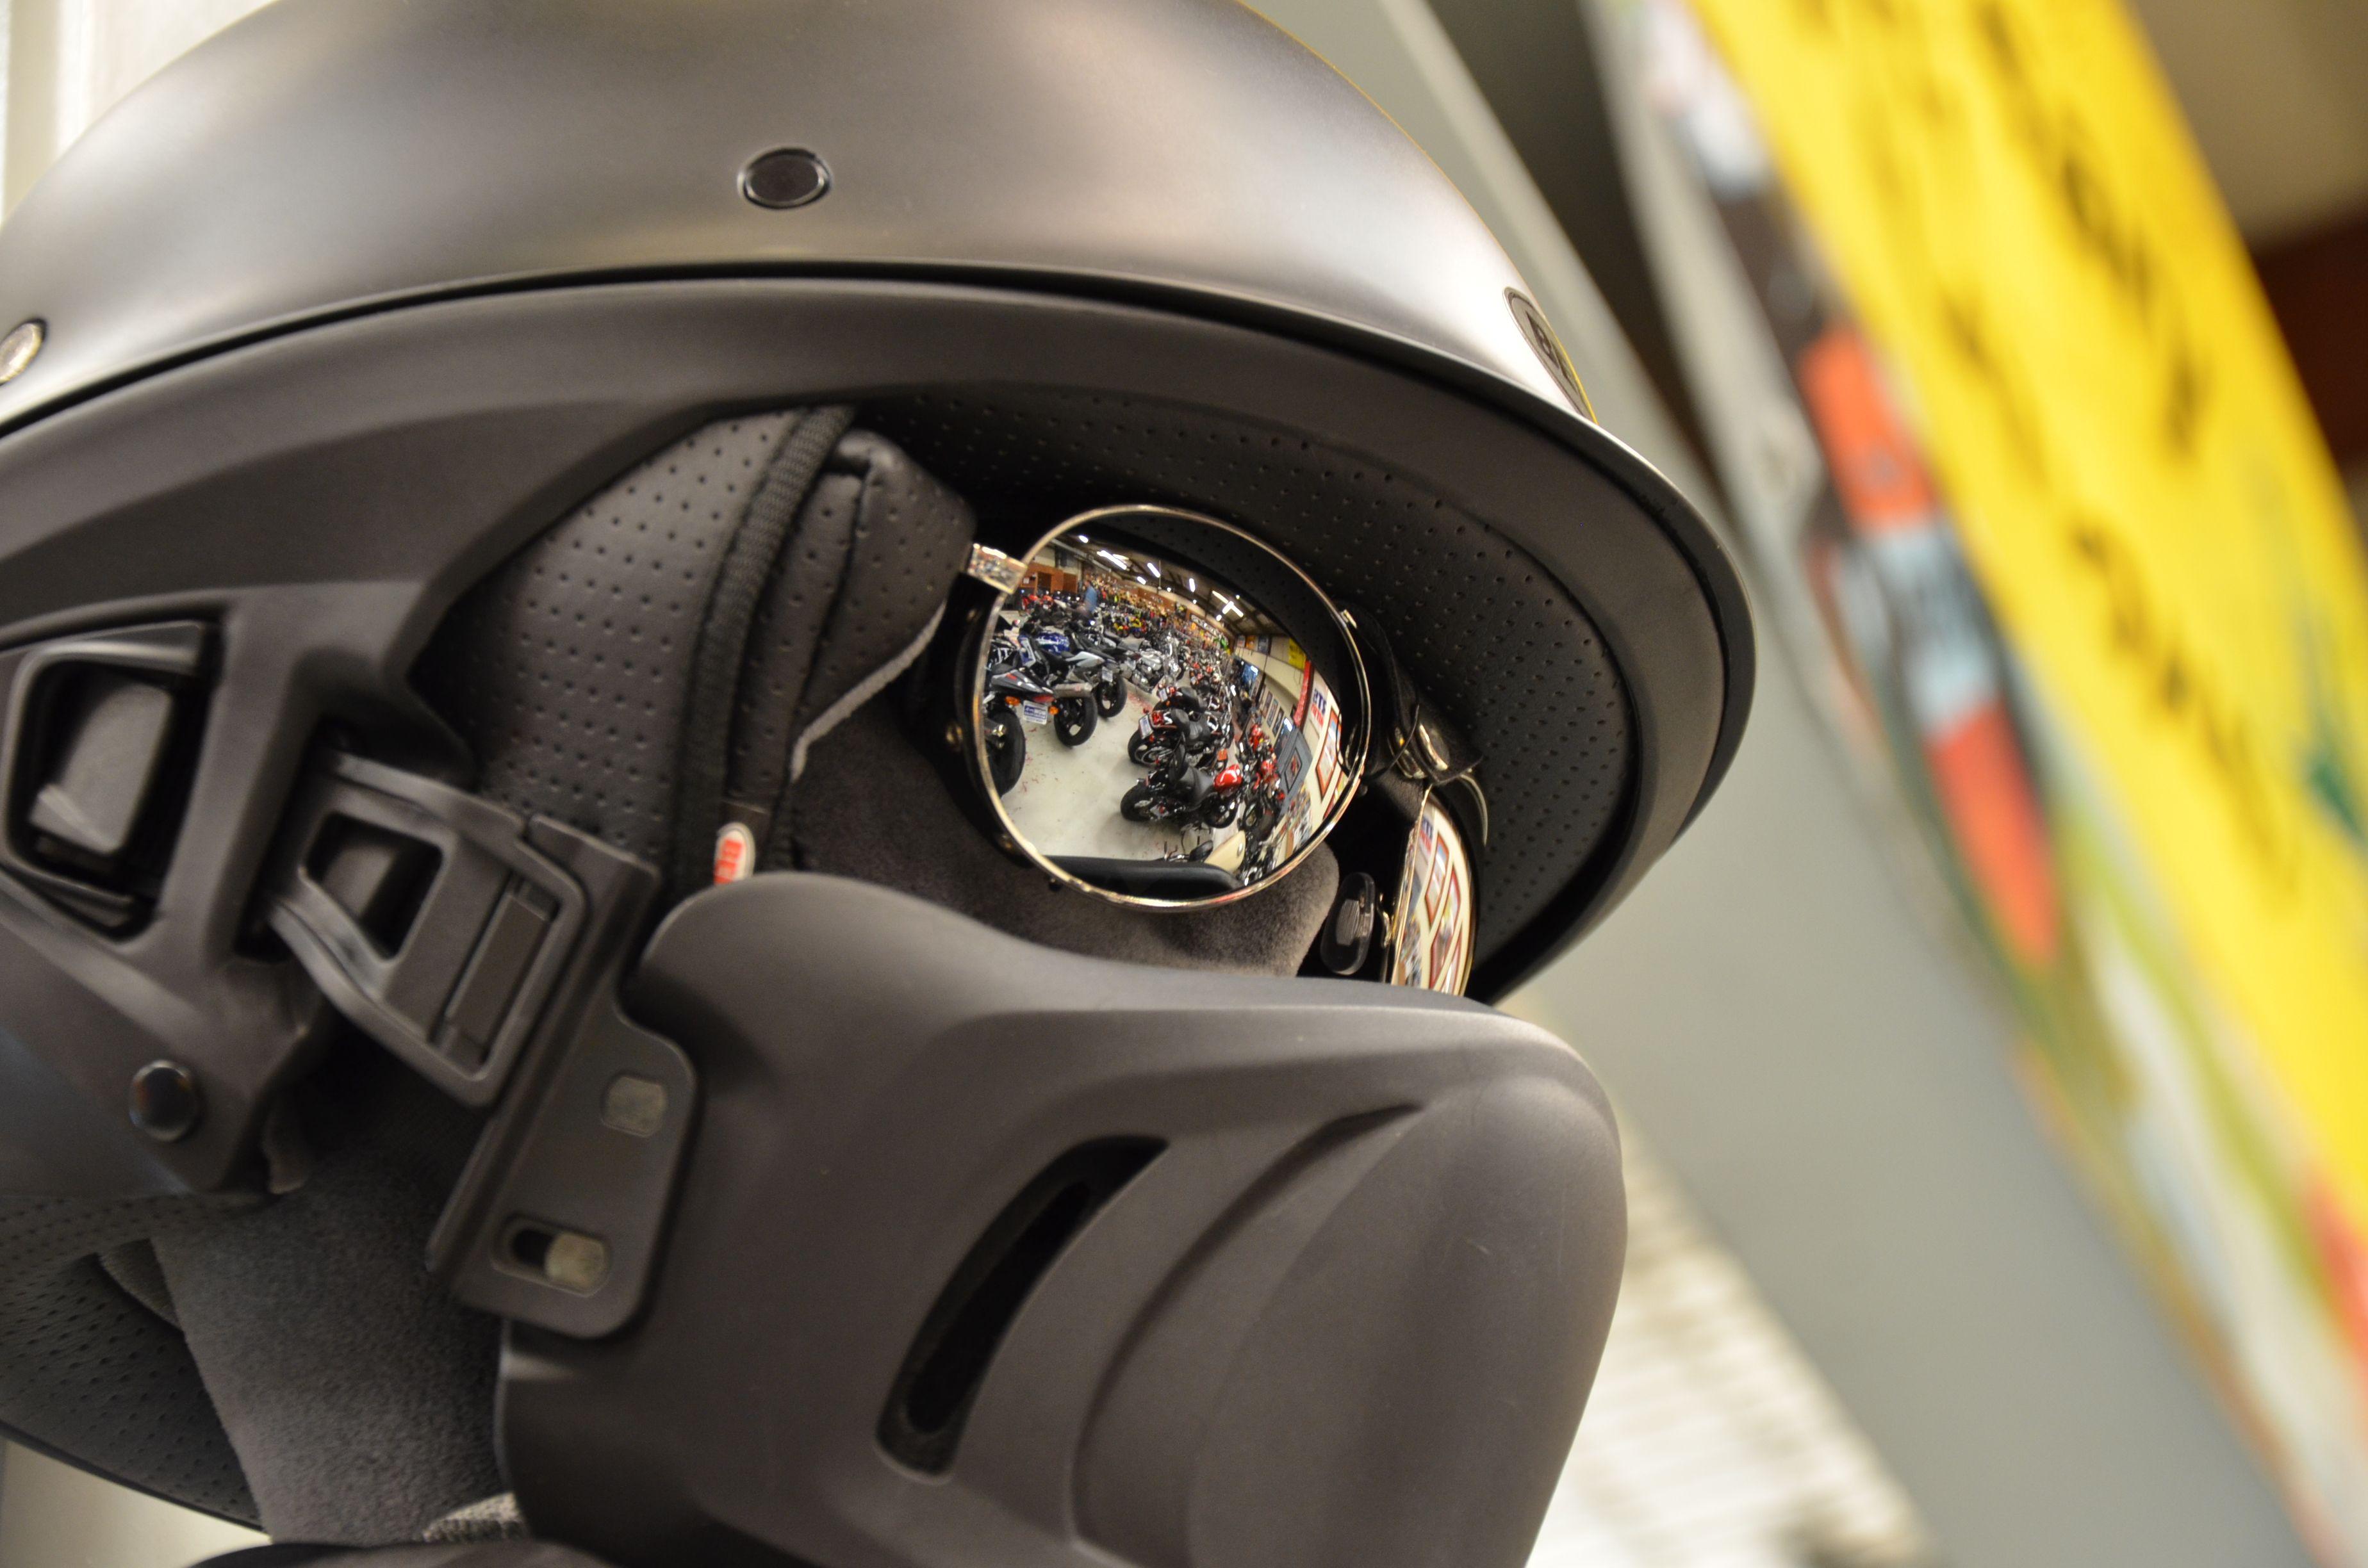 Bell Rogue Helmet and the super cop aviator glasses